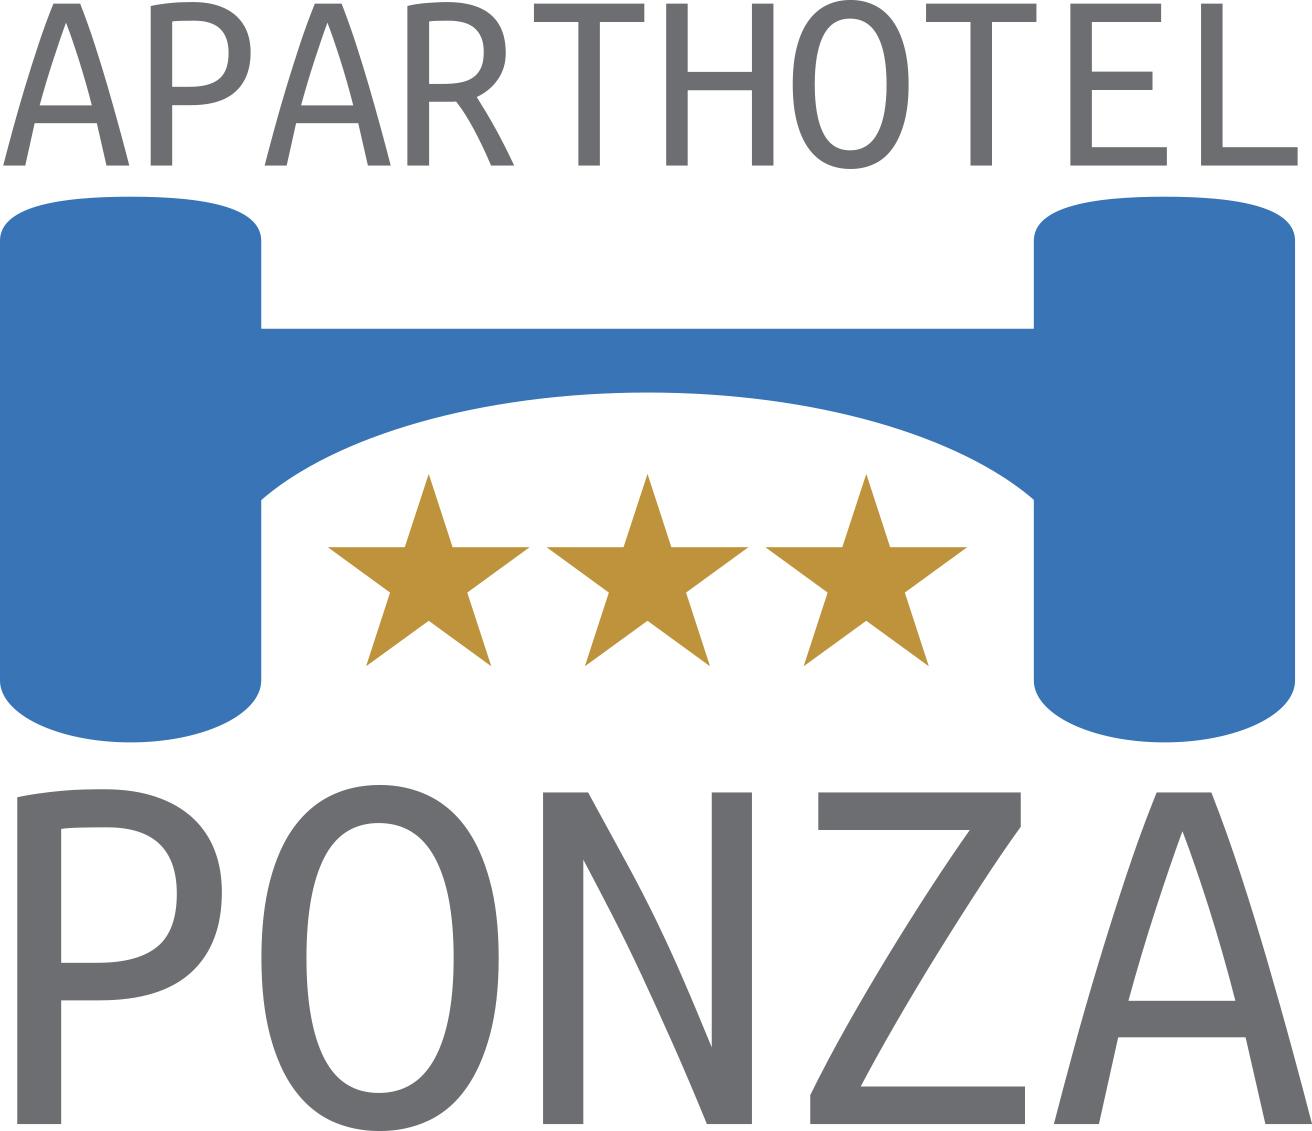 Aparthotel Ponza